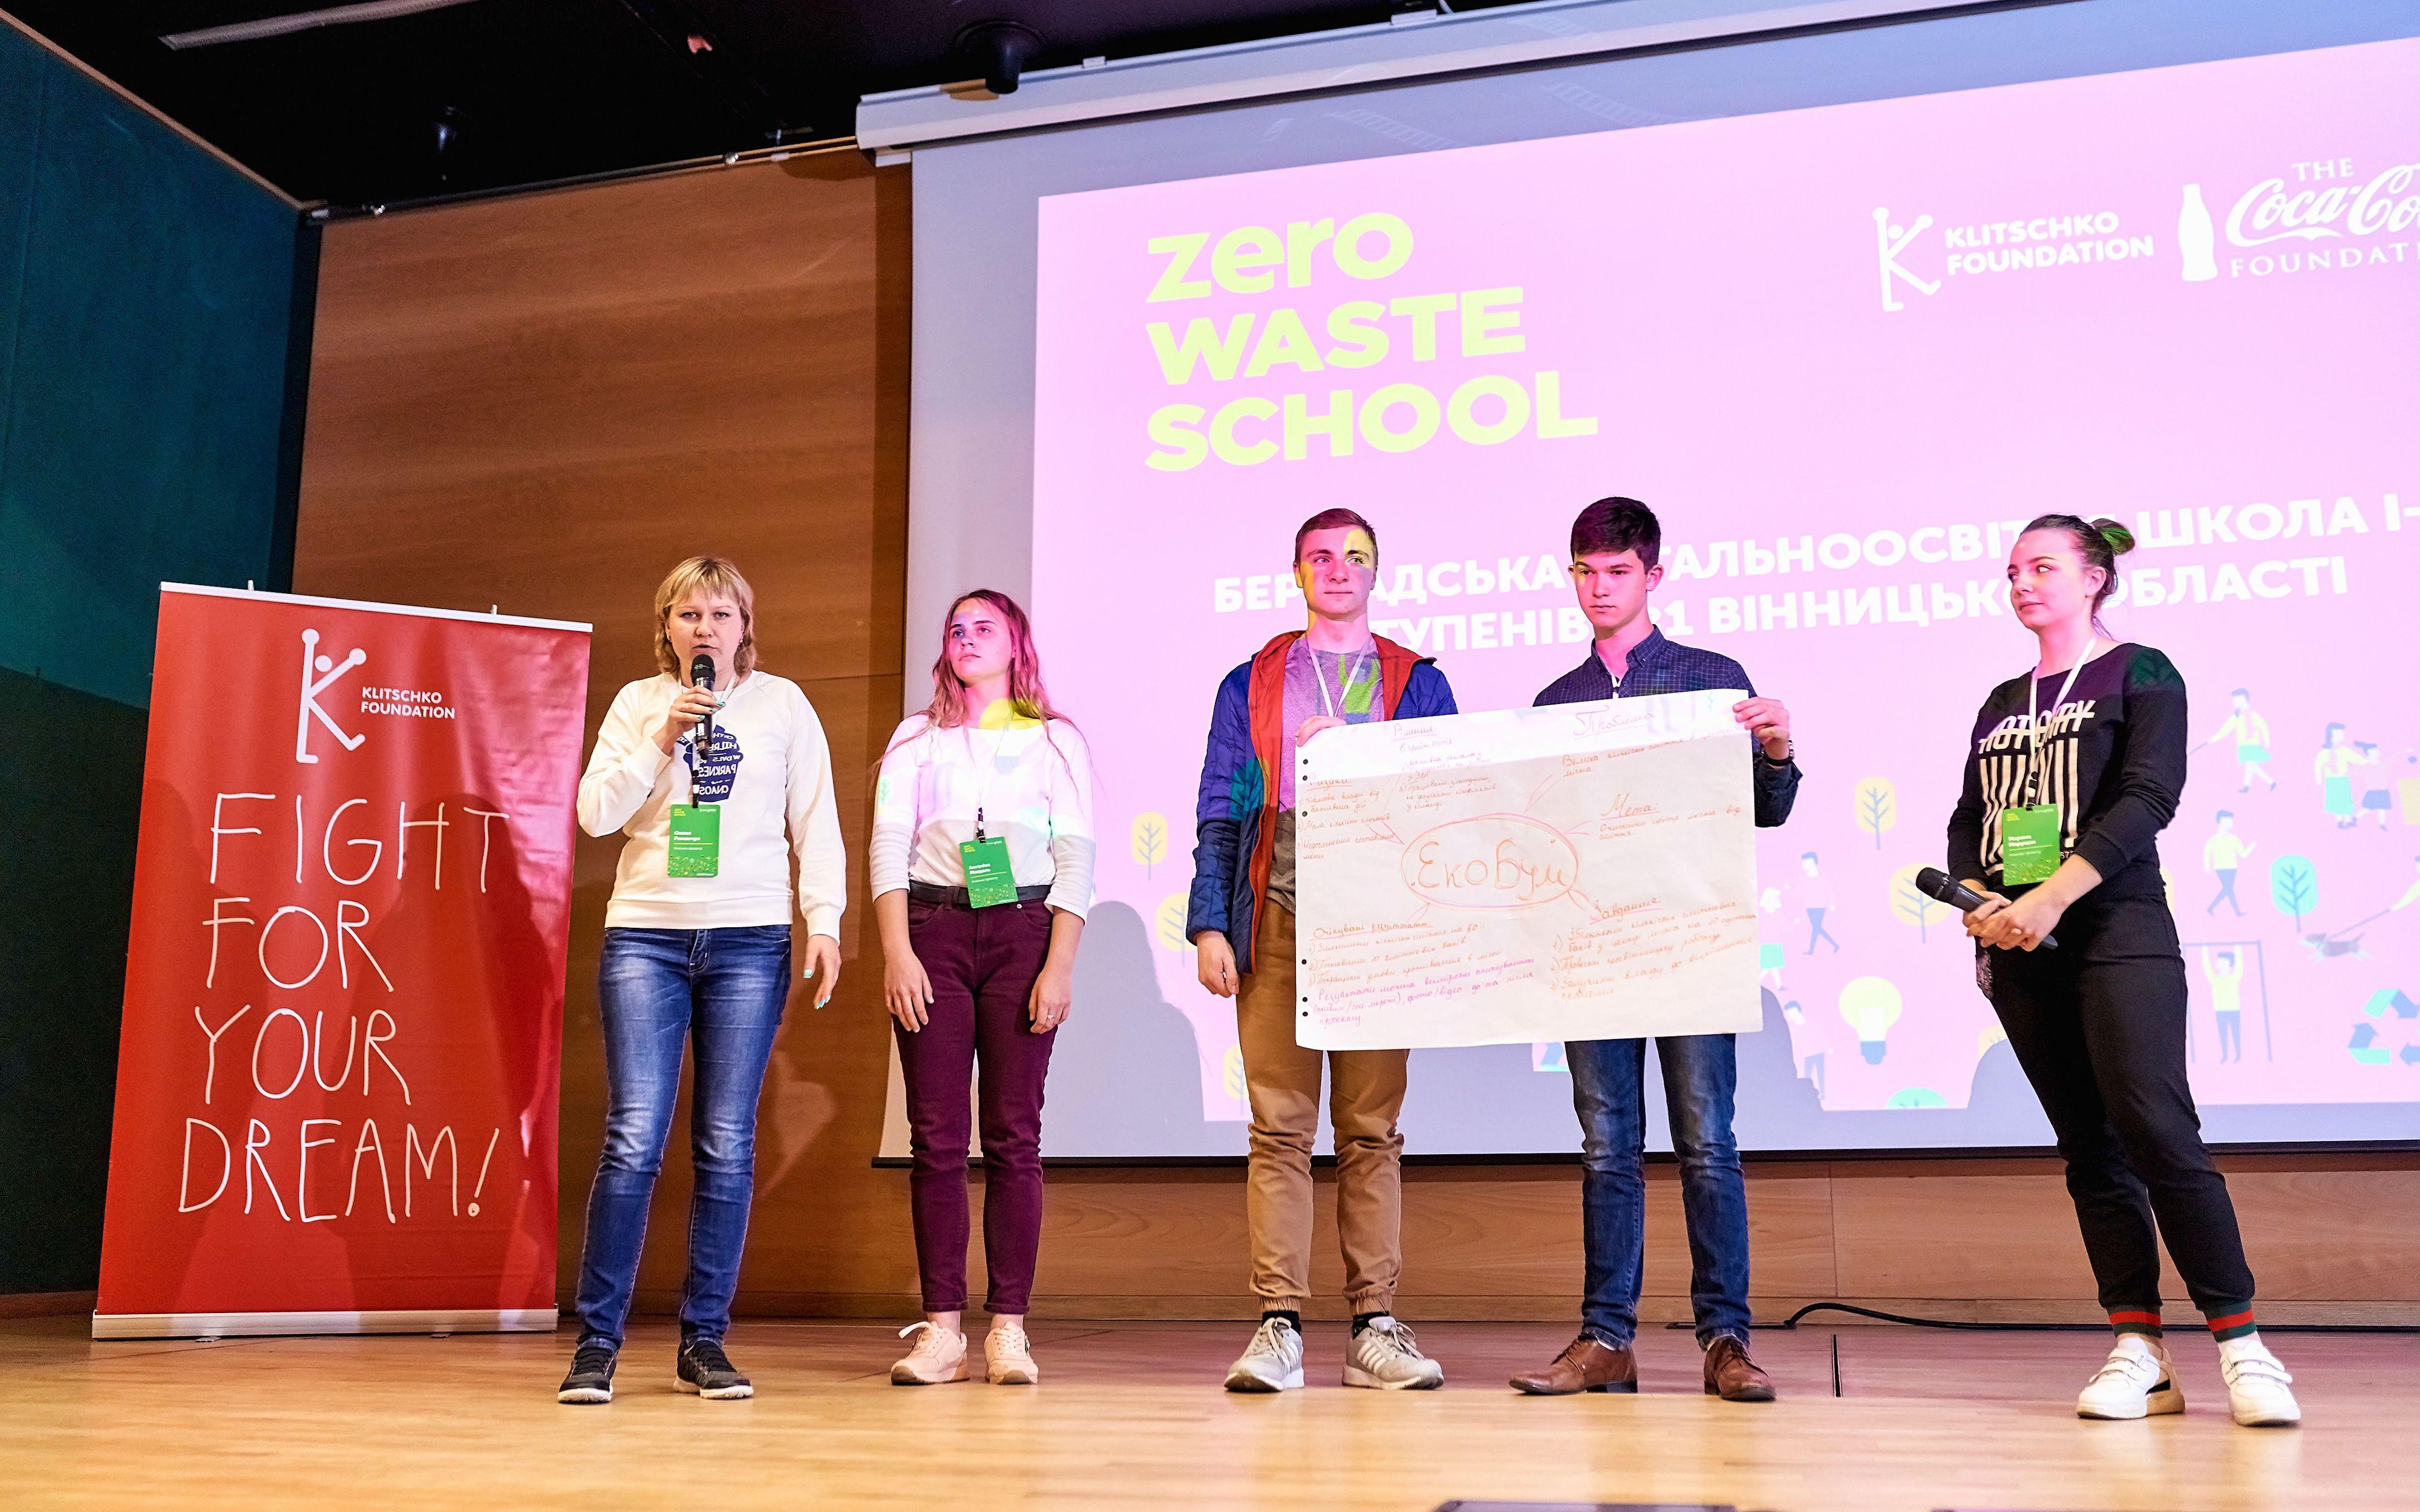 Zero Waste School